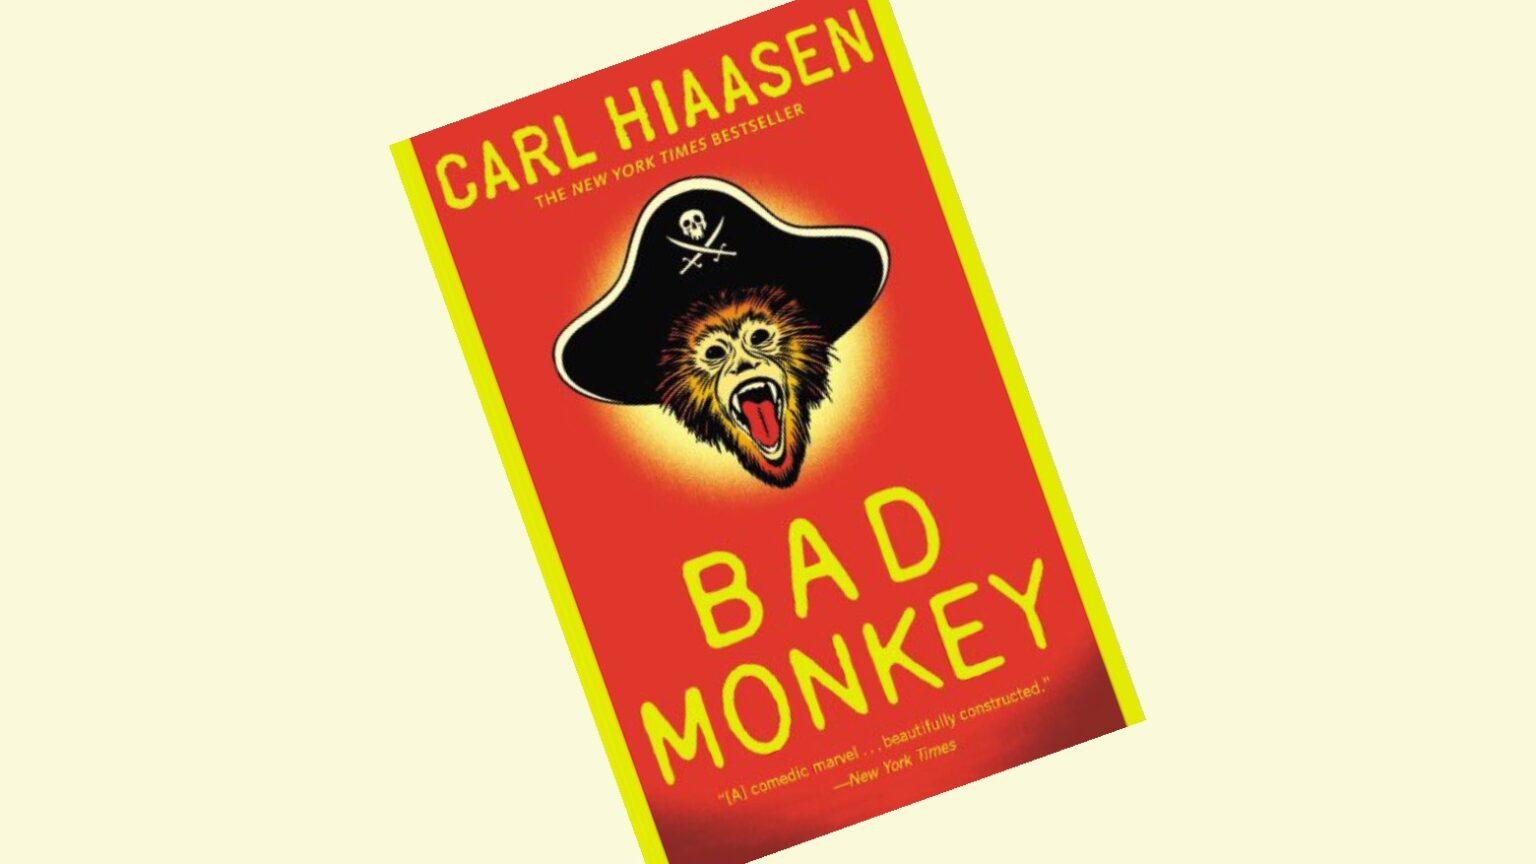 Vince Vaughn drama 'Bad Monkey' heading to Apple TV+